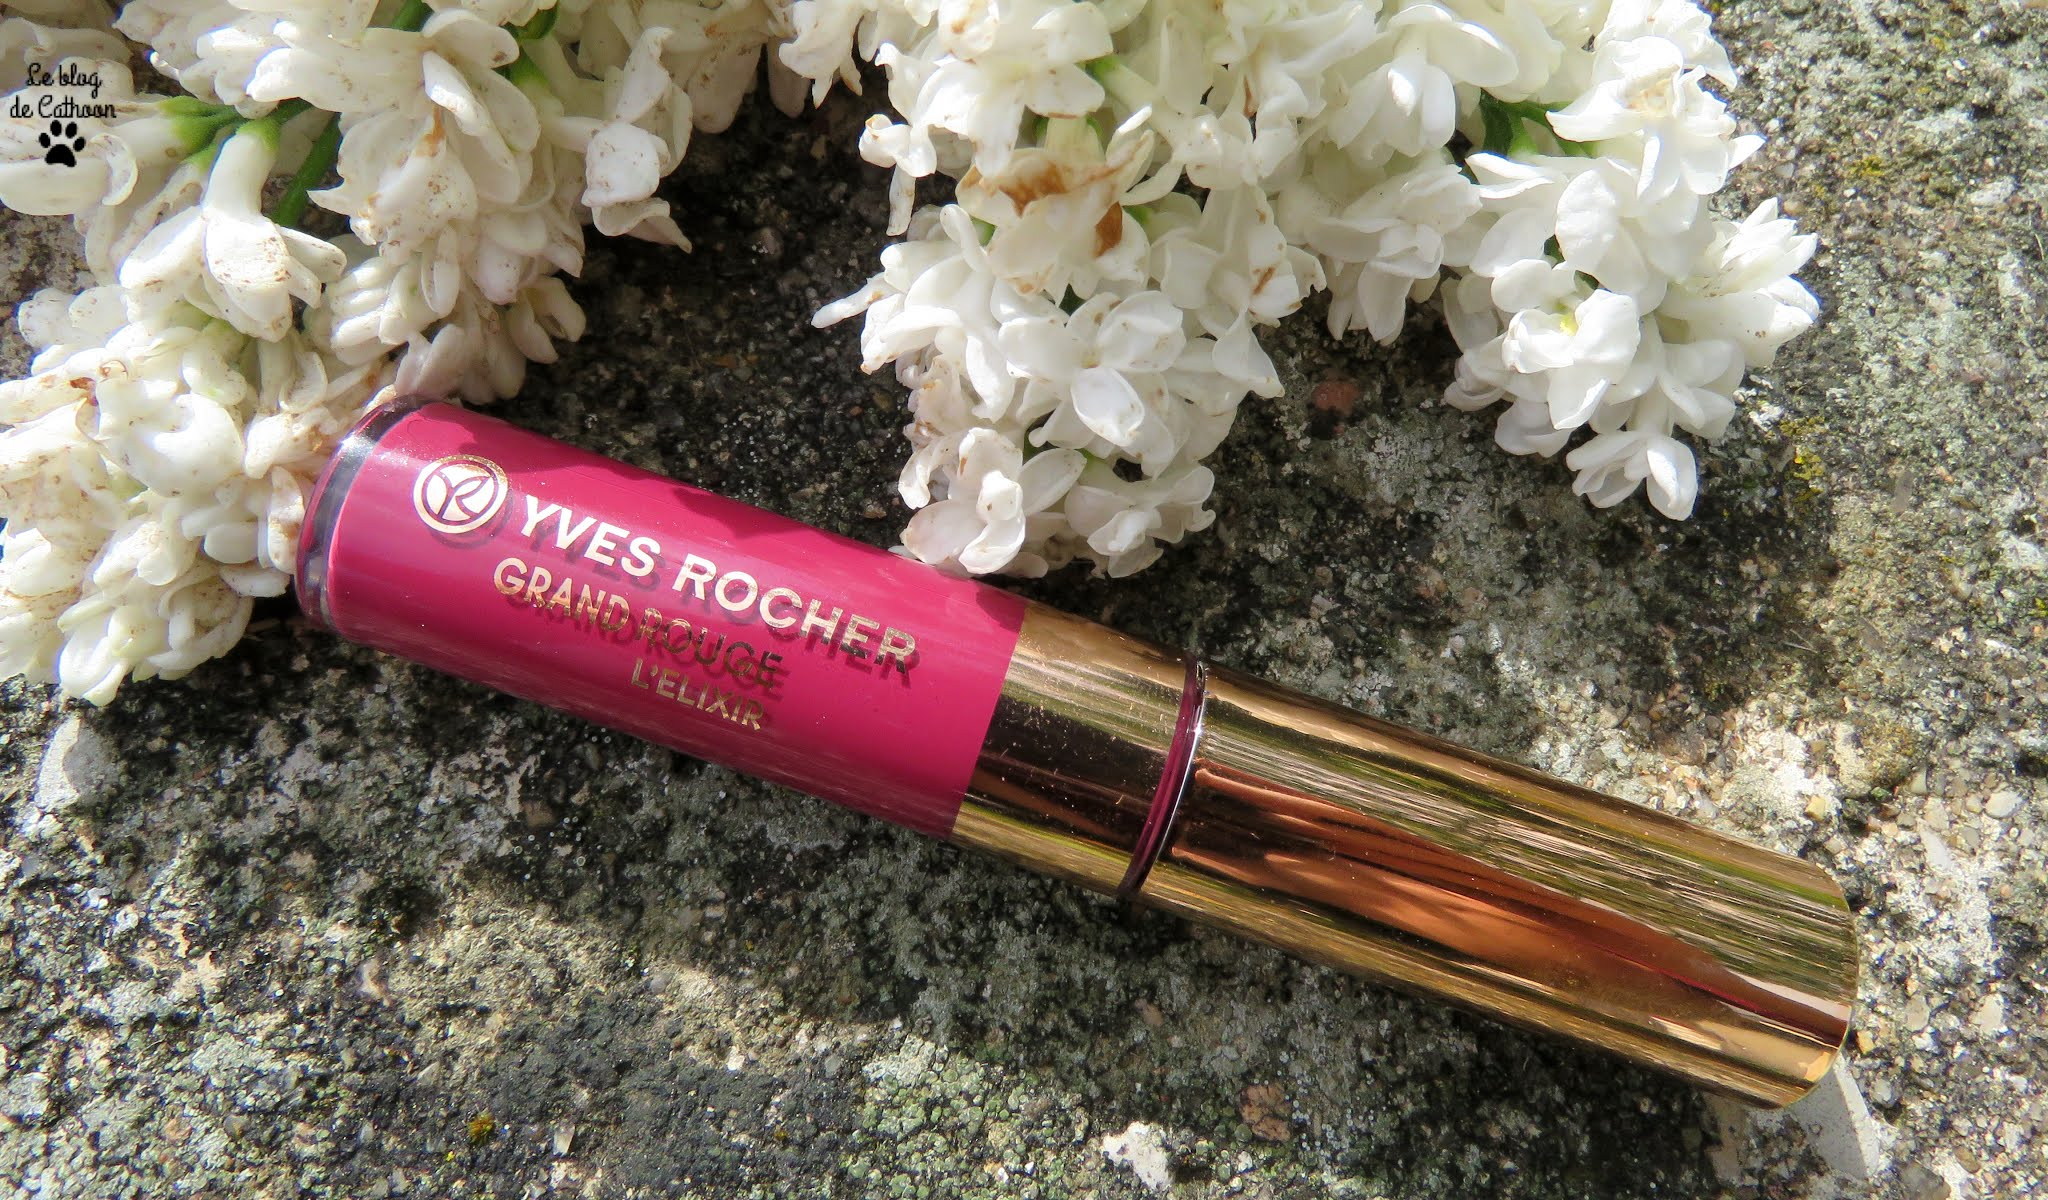 Grand Rouge L'Elixir Yves Rocher